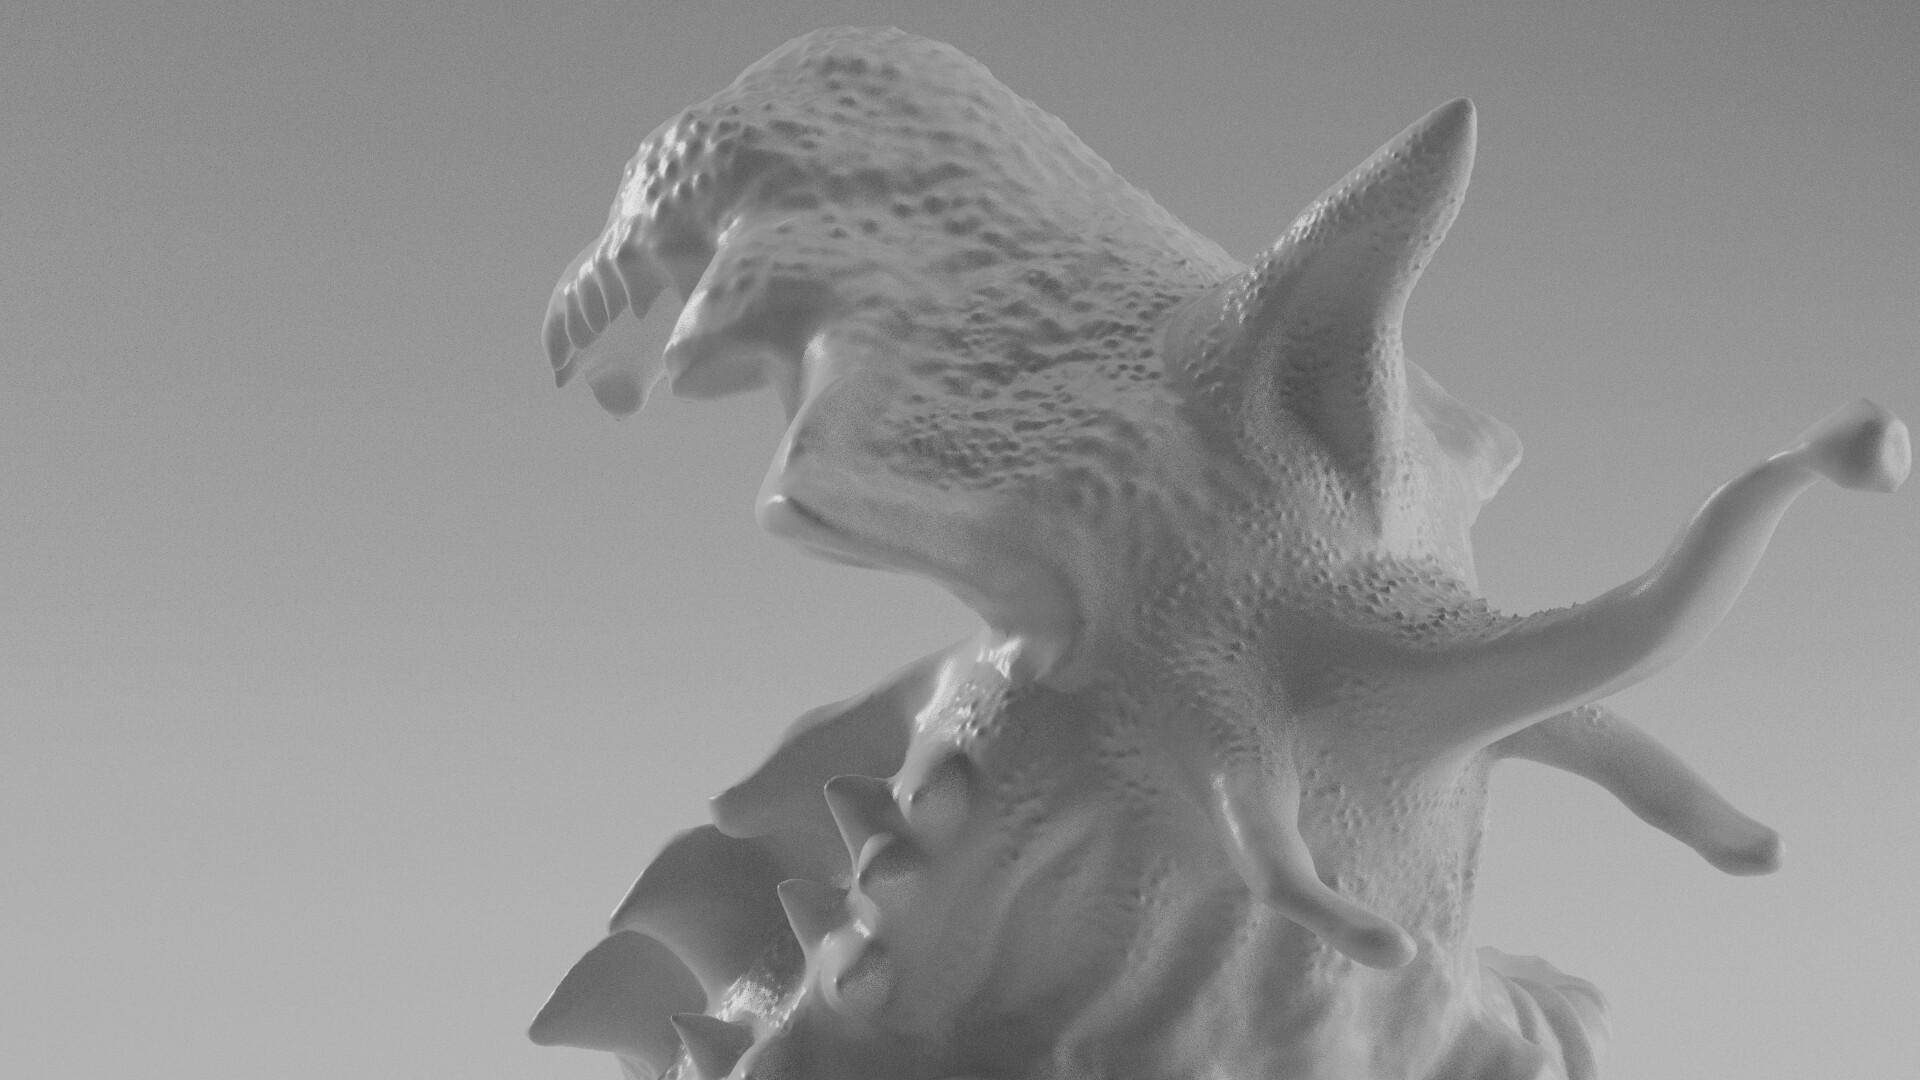 ArtStation - Nepenthe - Talisman Character, Adrian Marcisz